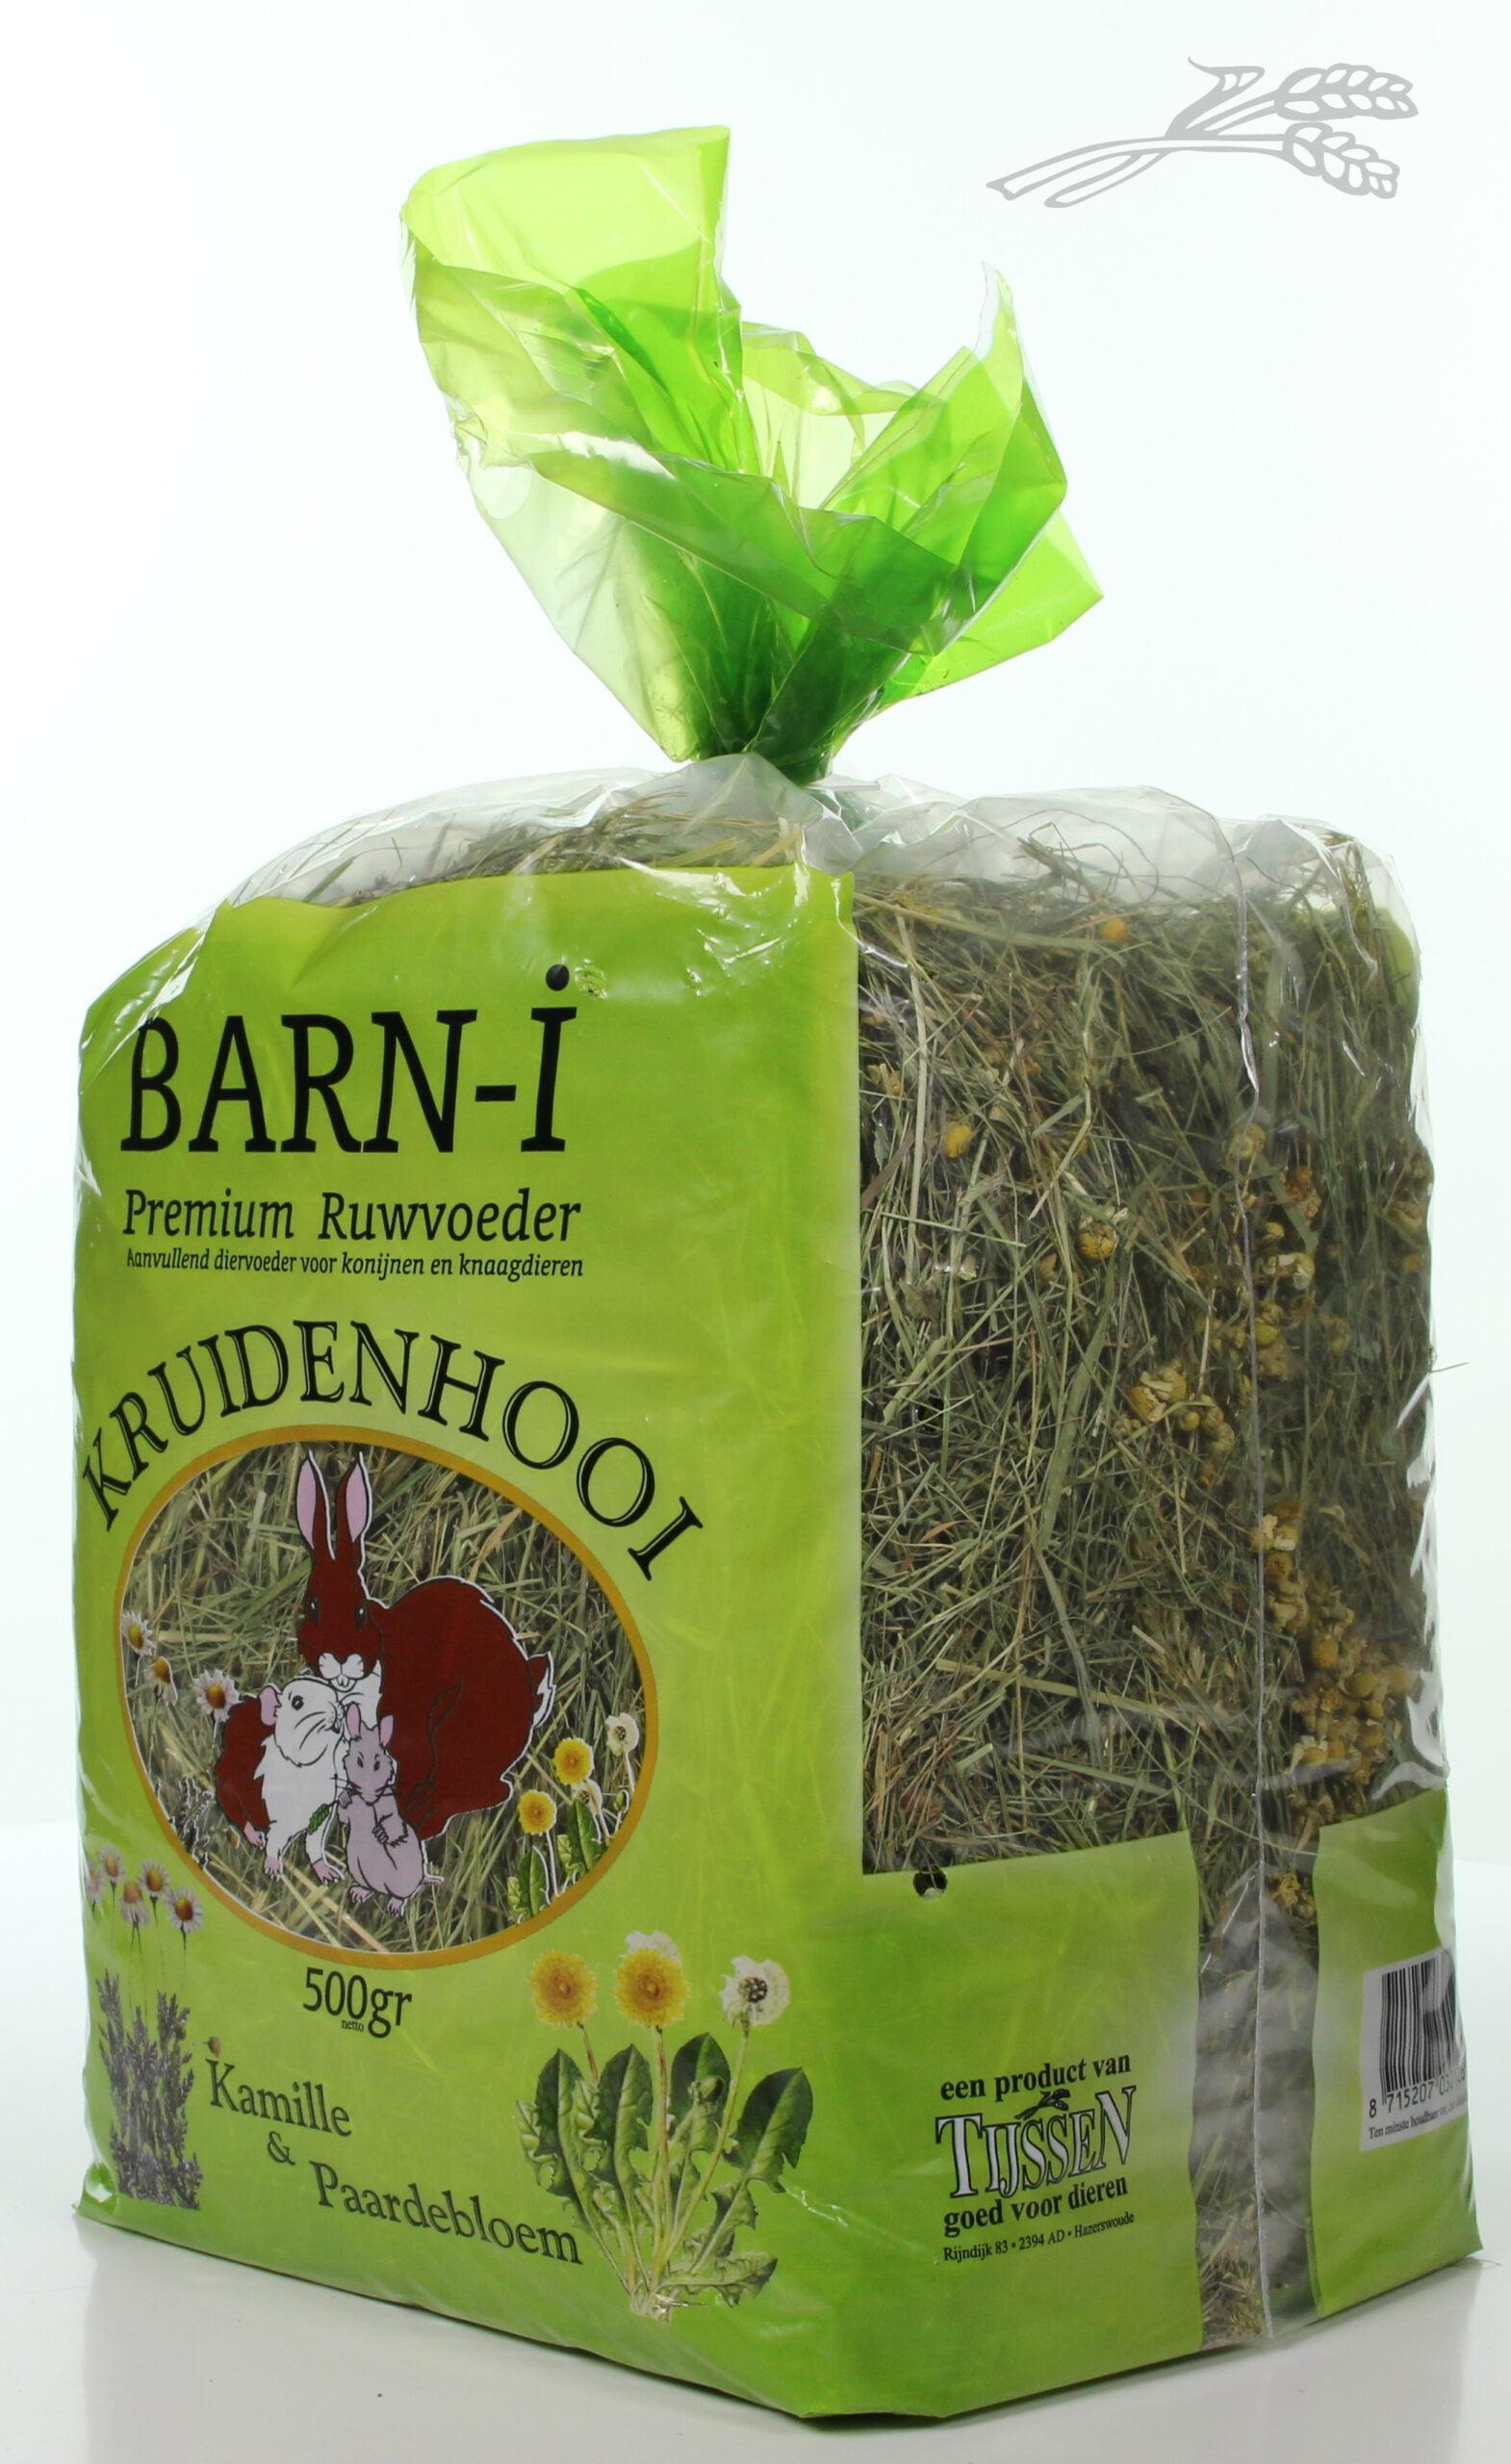 Barn-i Kruidenhooi Kamille & Paardenbloem 500gr